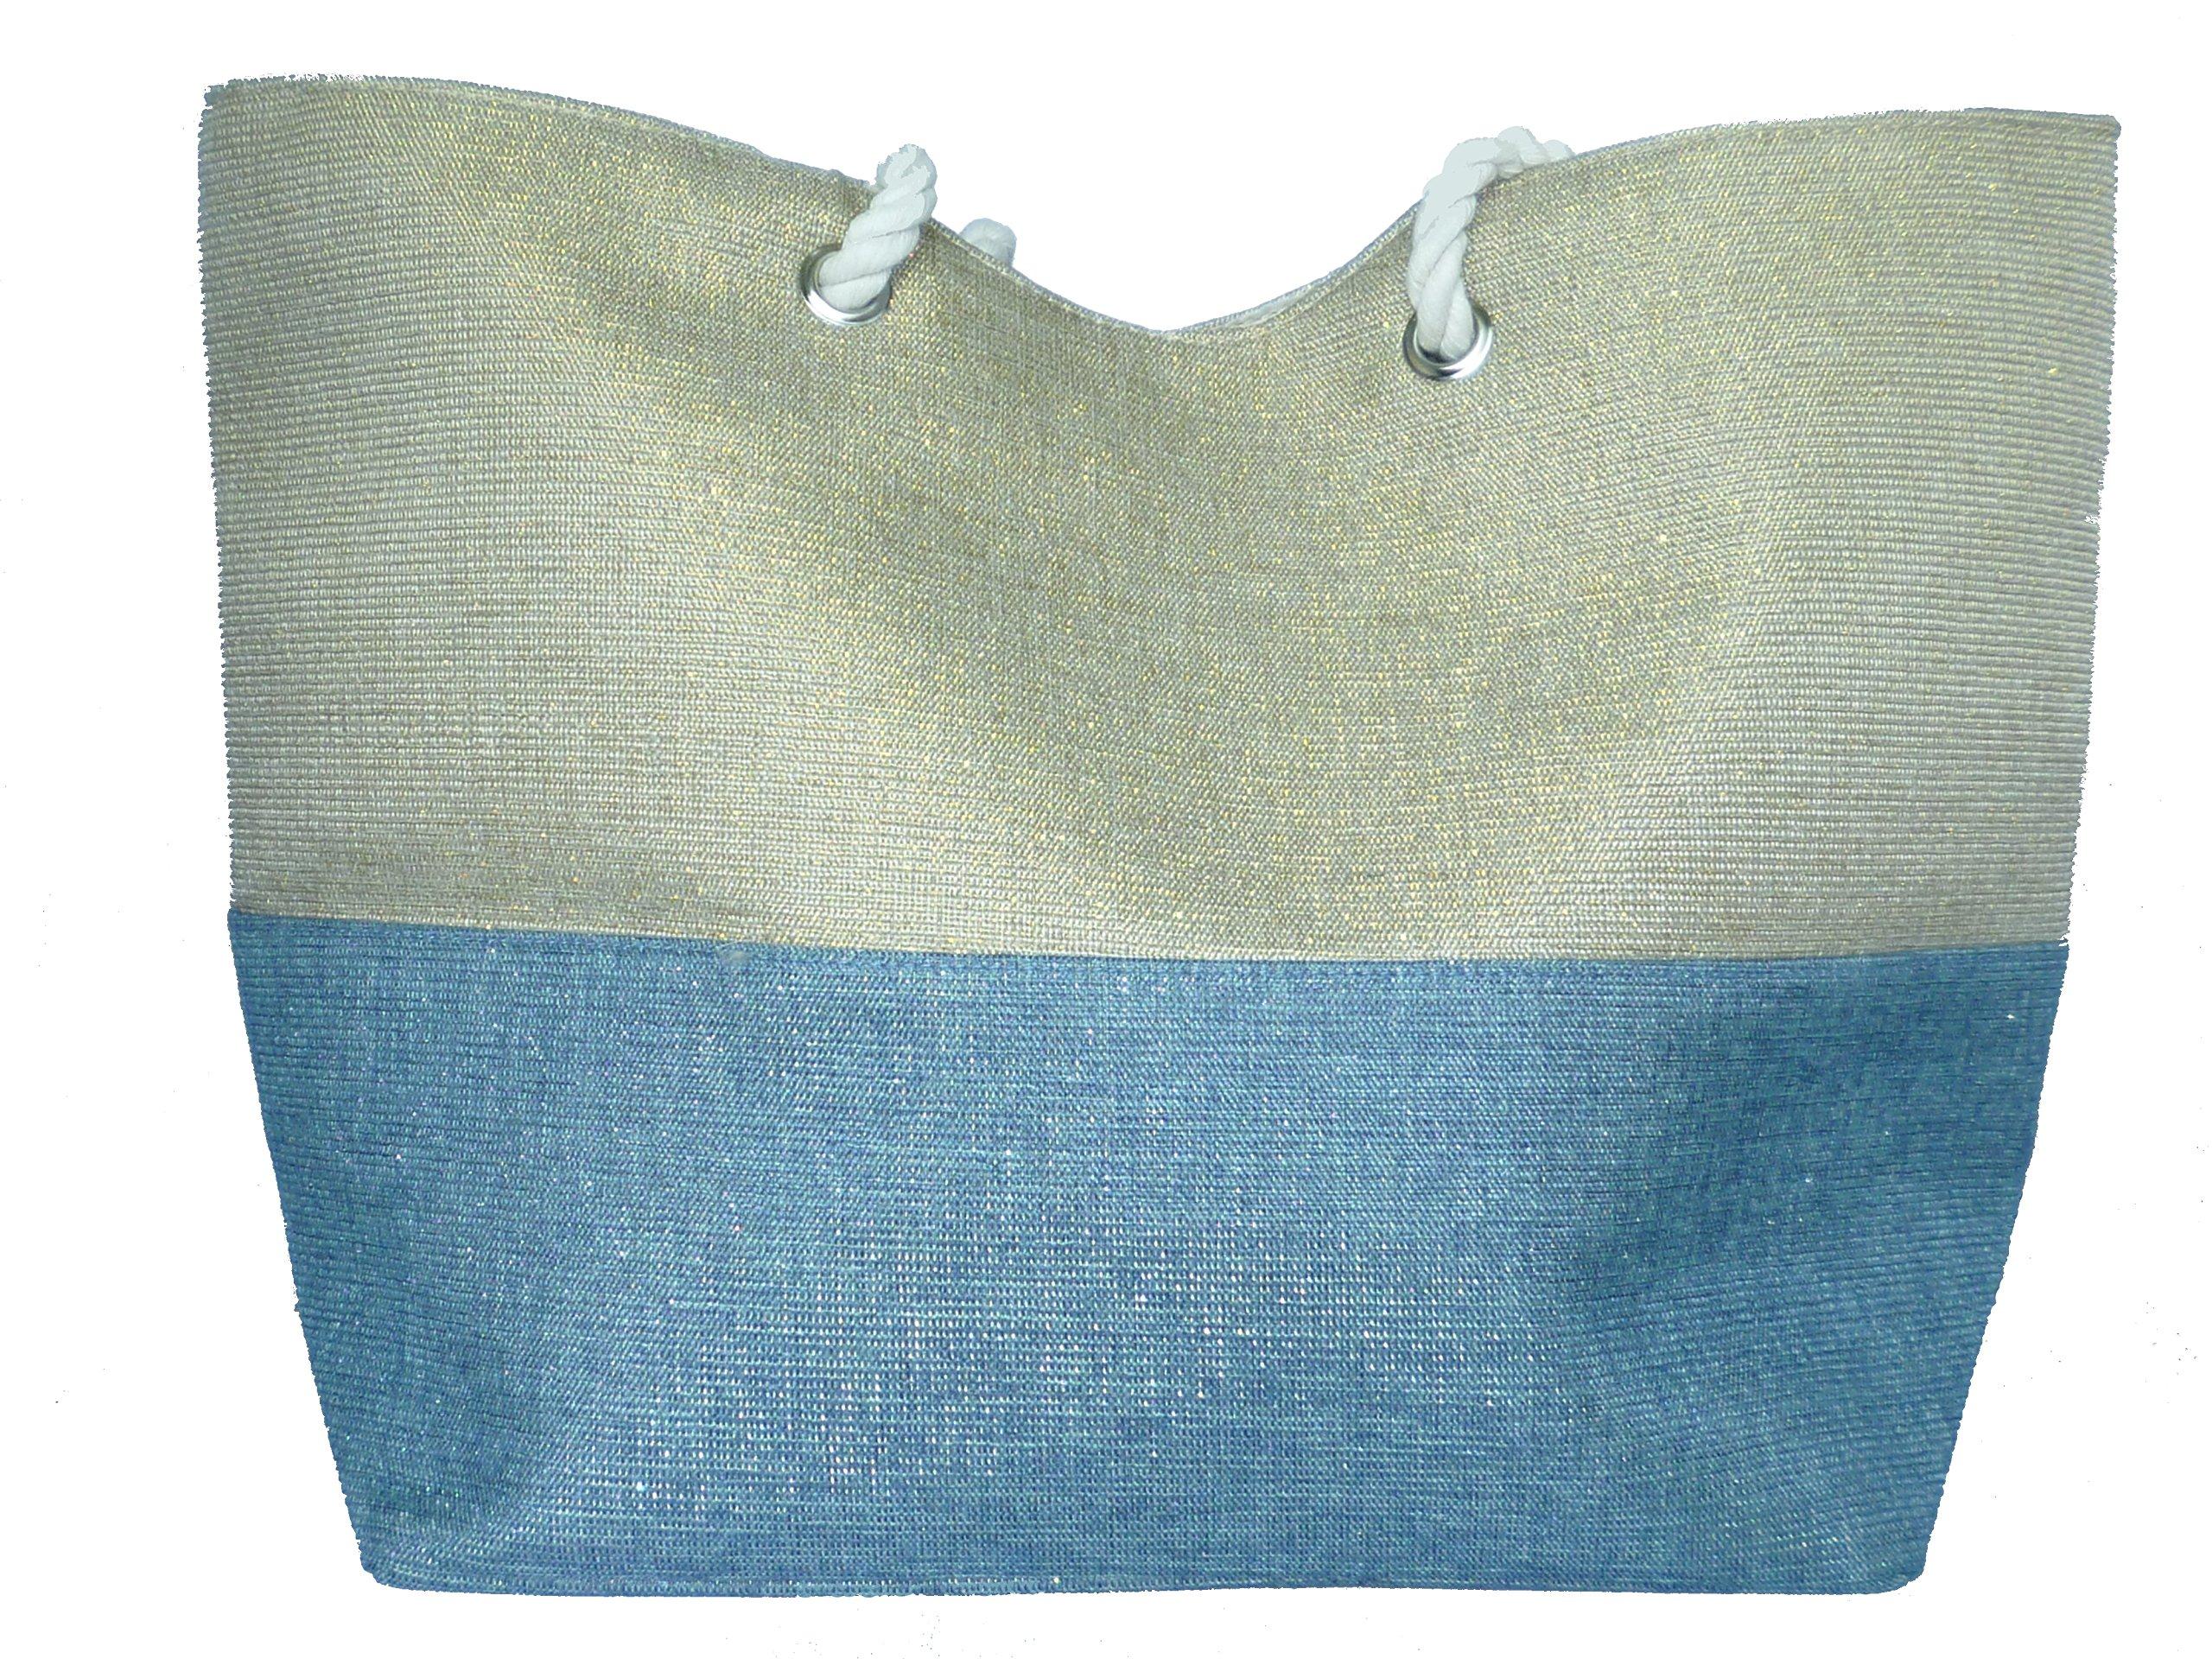 Versatile Shimmering Summer Tote or Beach Bag (Gold/Blue)